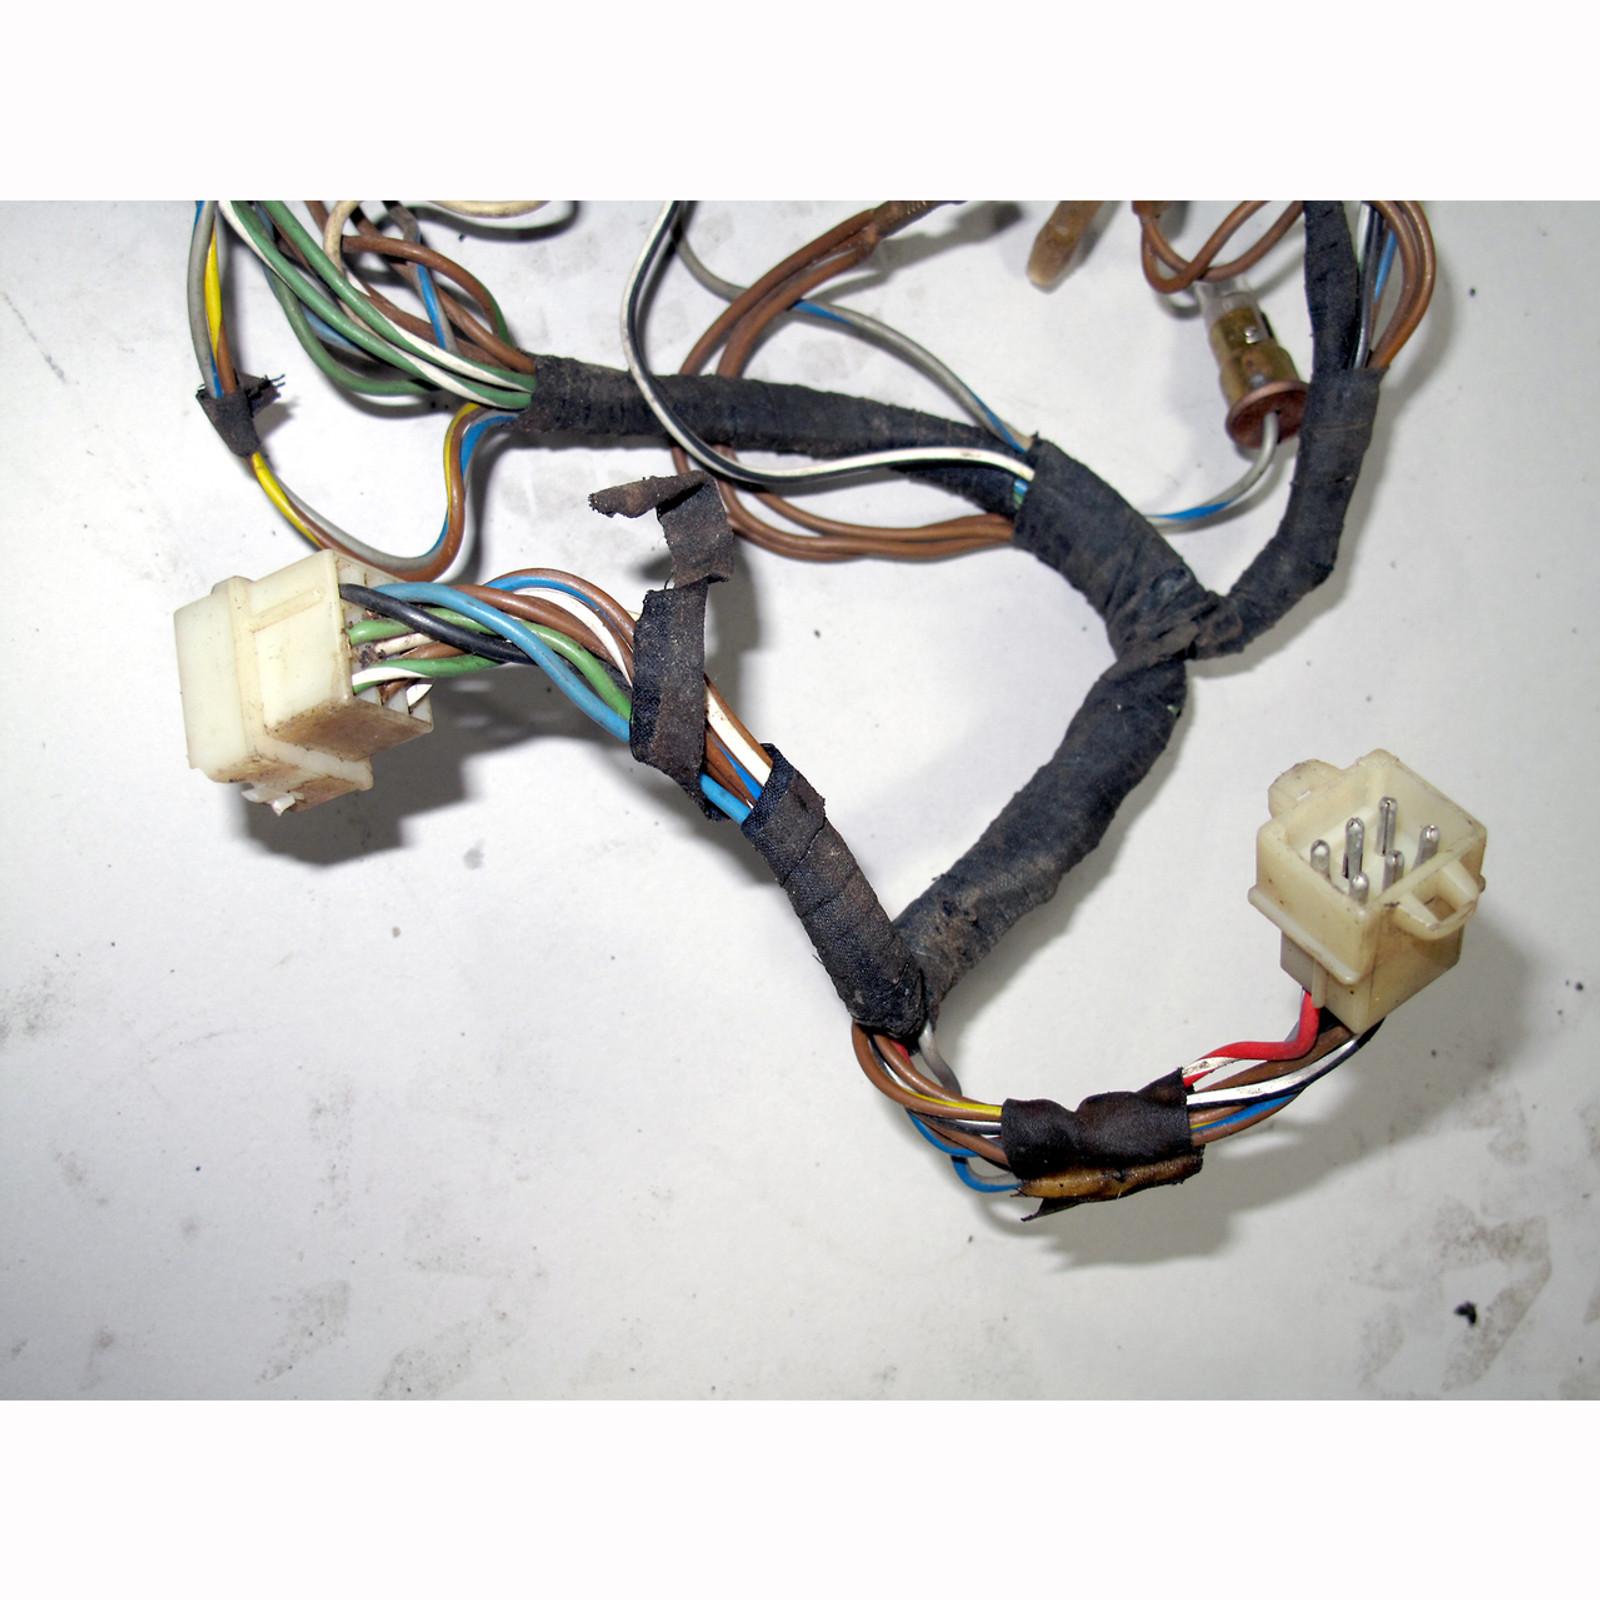 Pleasing Bmw E9 Wiring Loom Box Wiring Diagram Wiring Cloud Philuggs Outletorg